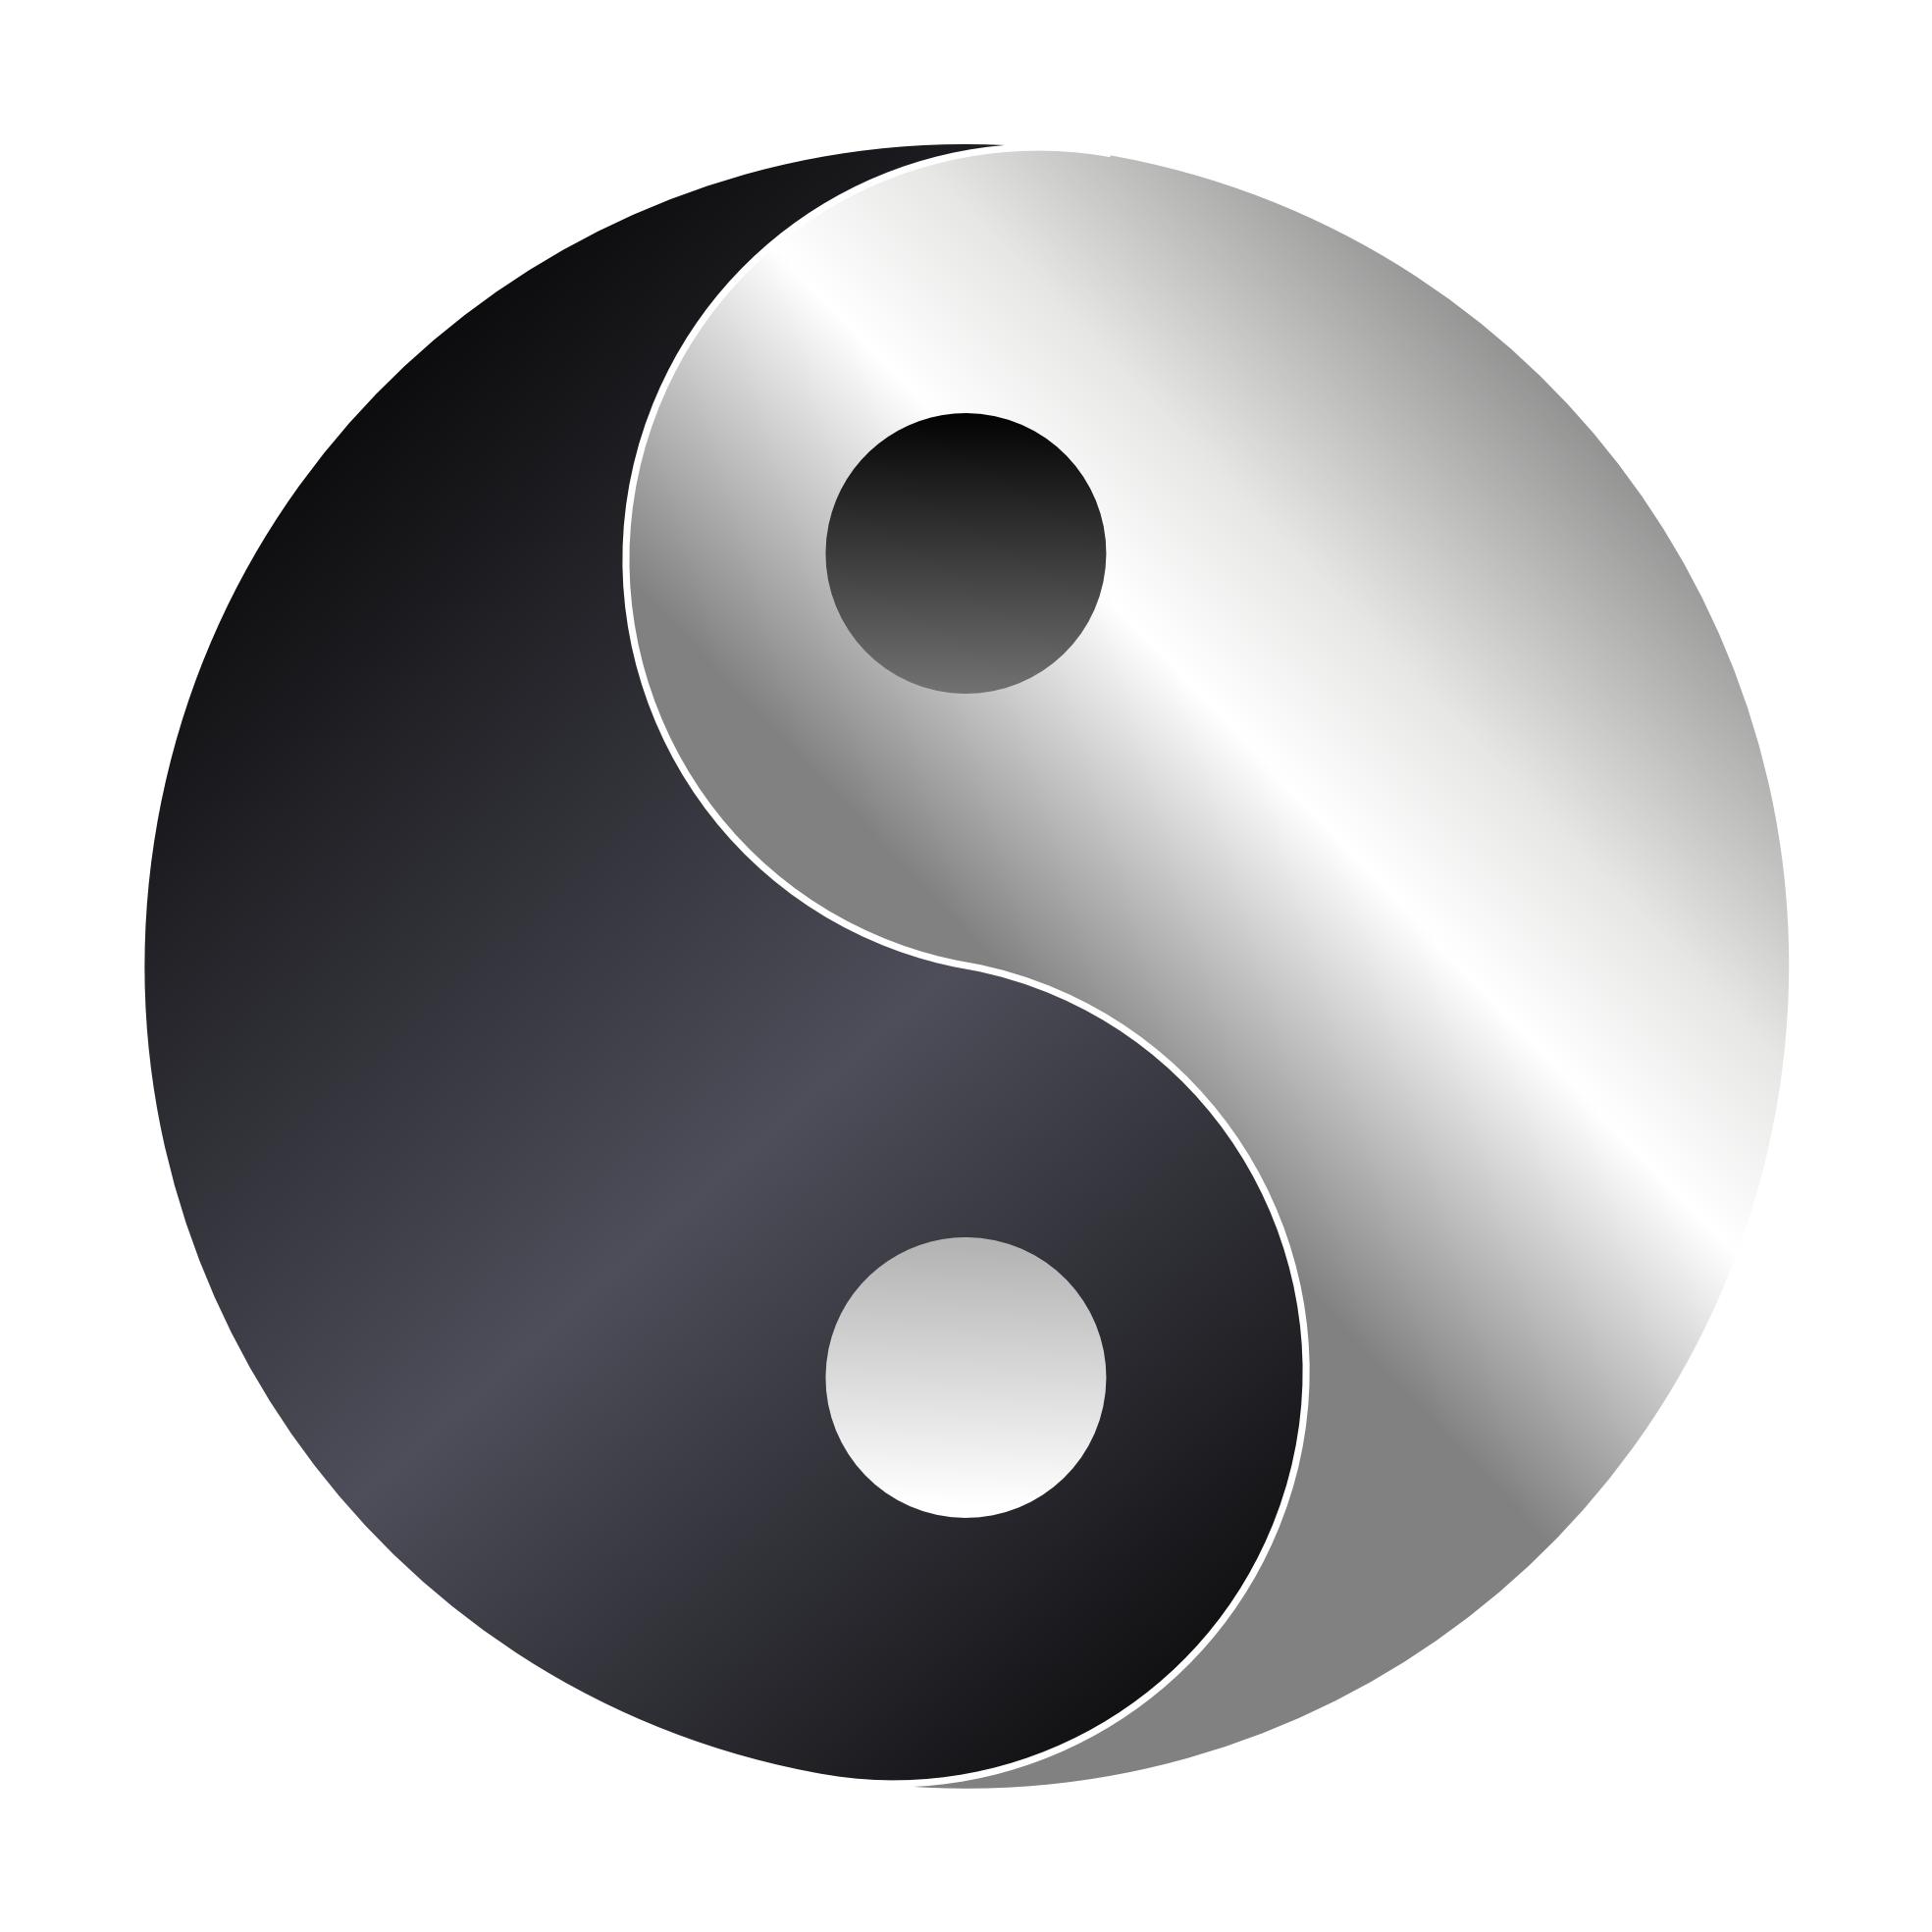 Apple yin yang clipart graphic transparent yin yang - Google Search | Yoga | Pinterest | Yin yang graphic transparent